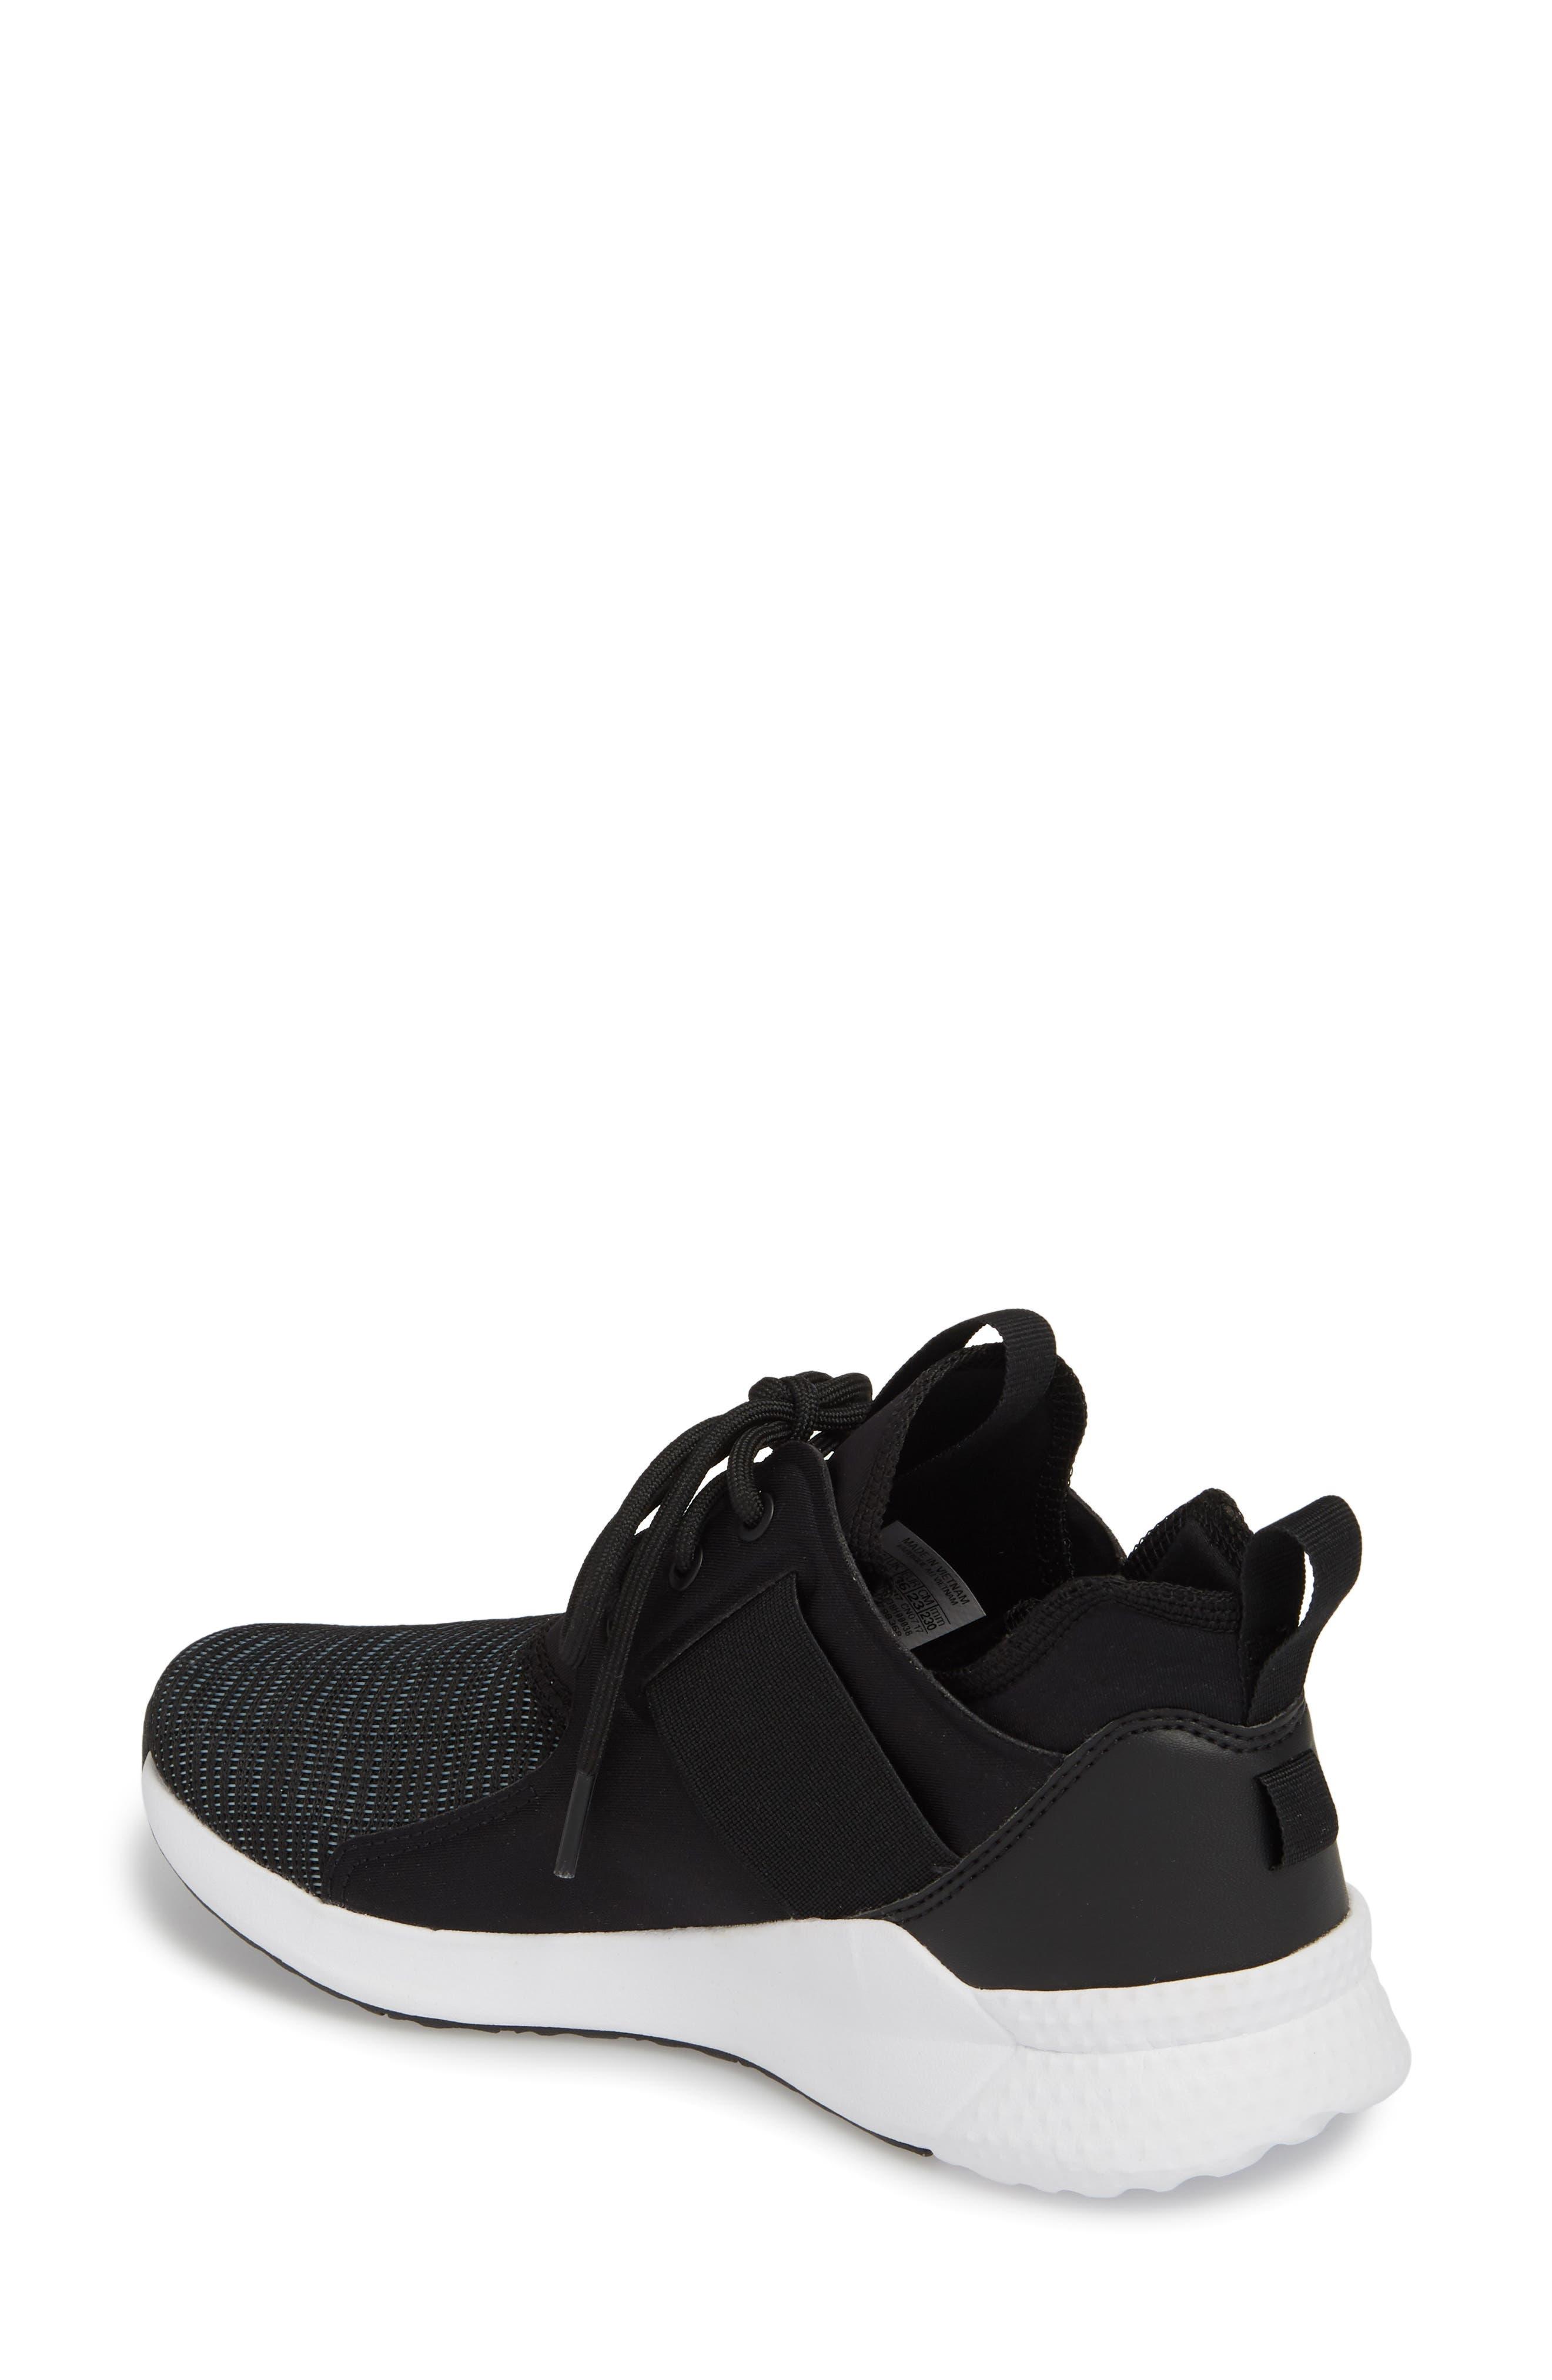 Guresu 1.0 High Top Sneaker,                             Alternate thumbnail 2, color,                             005